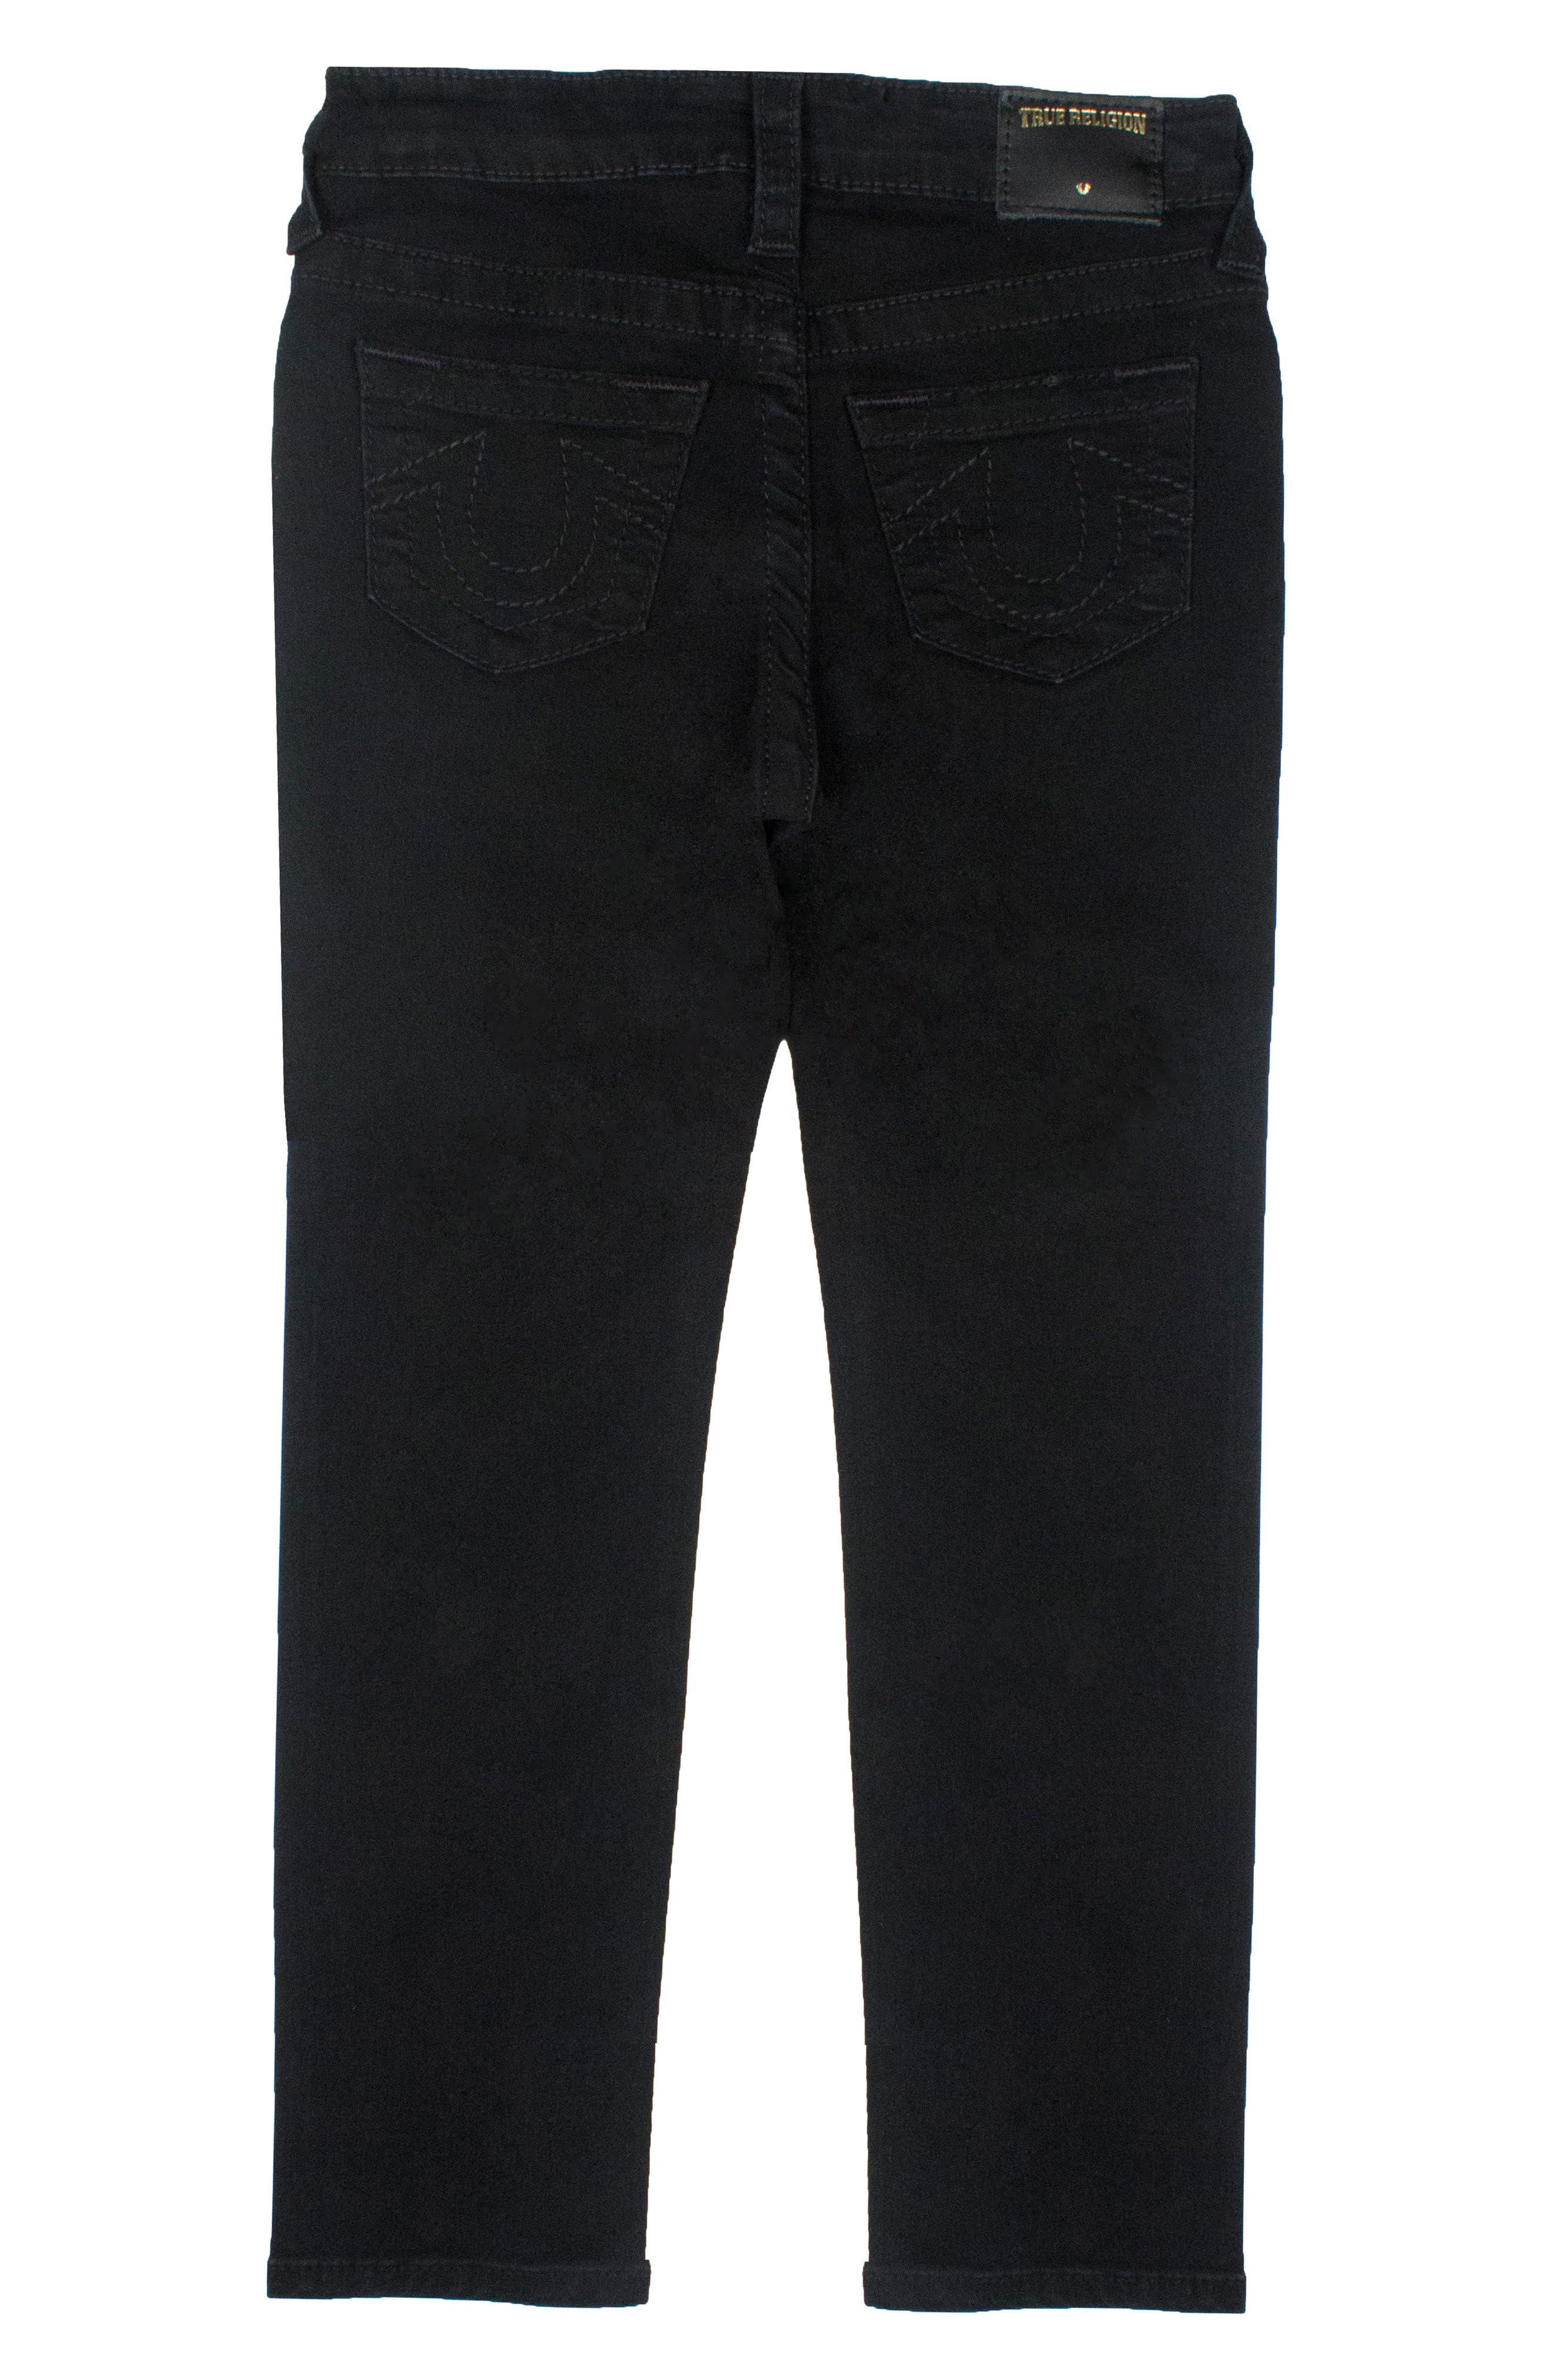 Alternate Image 2  - True Religion Brand Jeans Geno Single End Jeans (Toddler Boys & Little Boys)